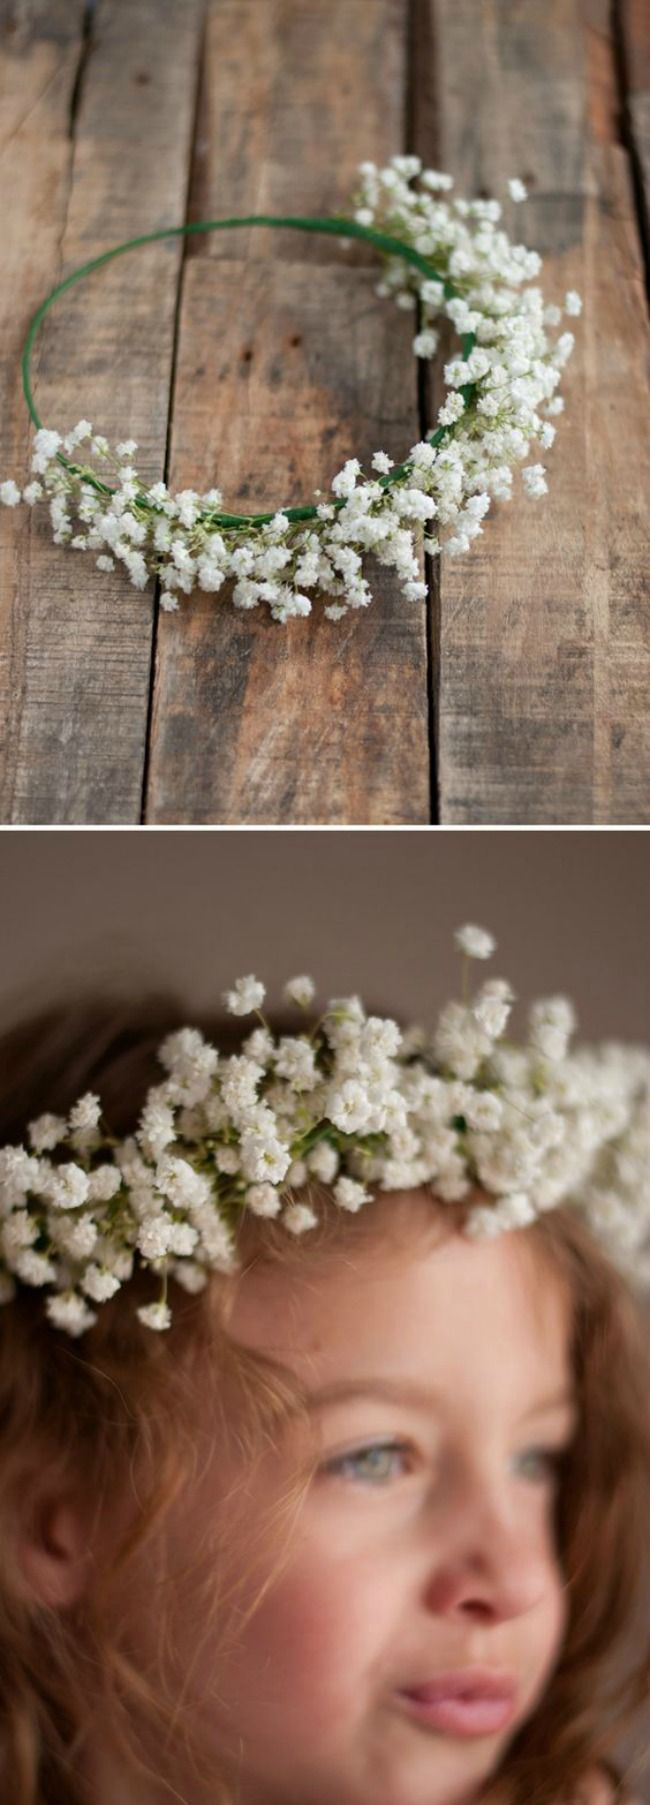 How To Make A Flower Crown Baby S Breath Crown Flower Girl Crown Diy Nedimeler Cicek Taclar Dugun Buketleri